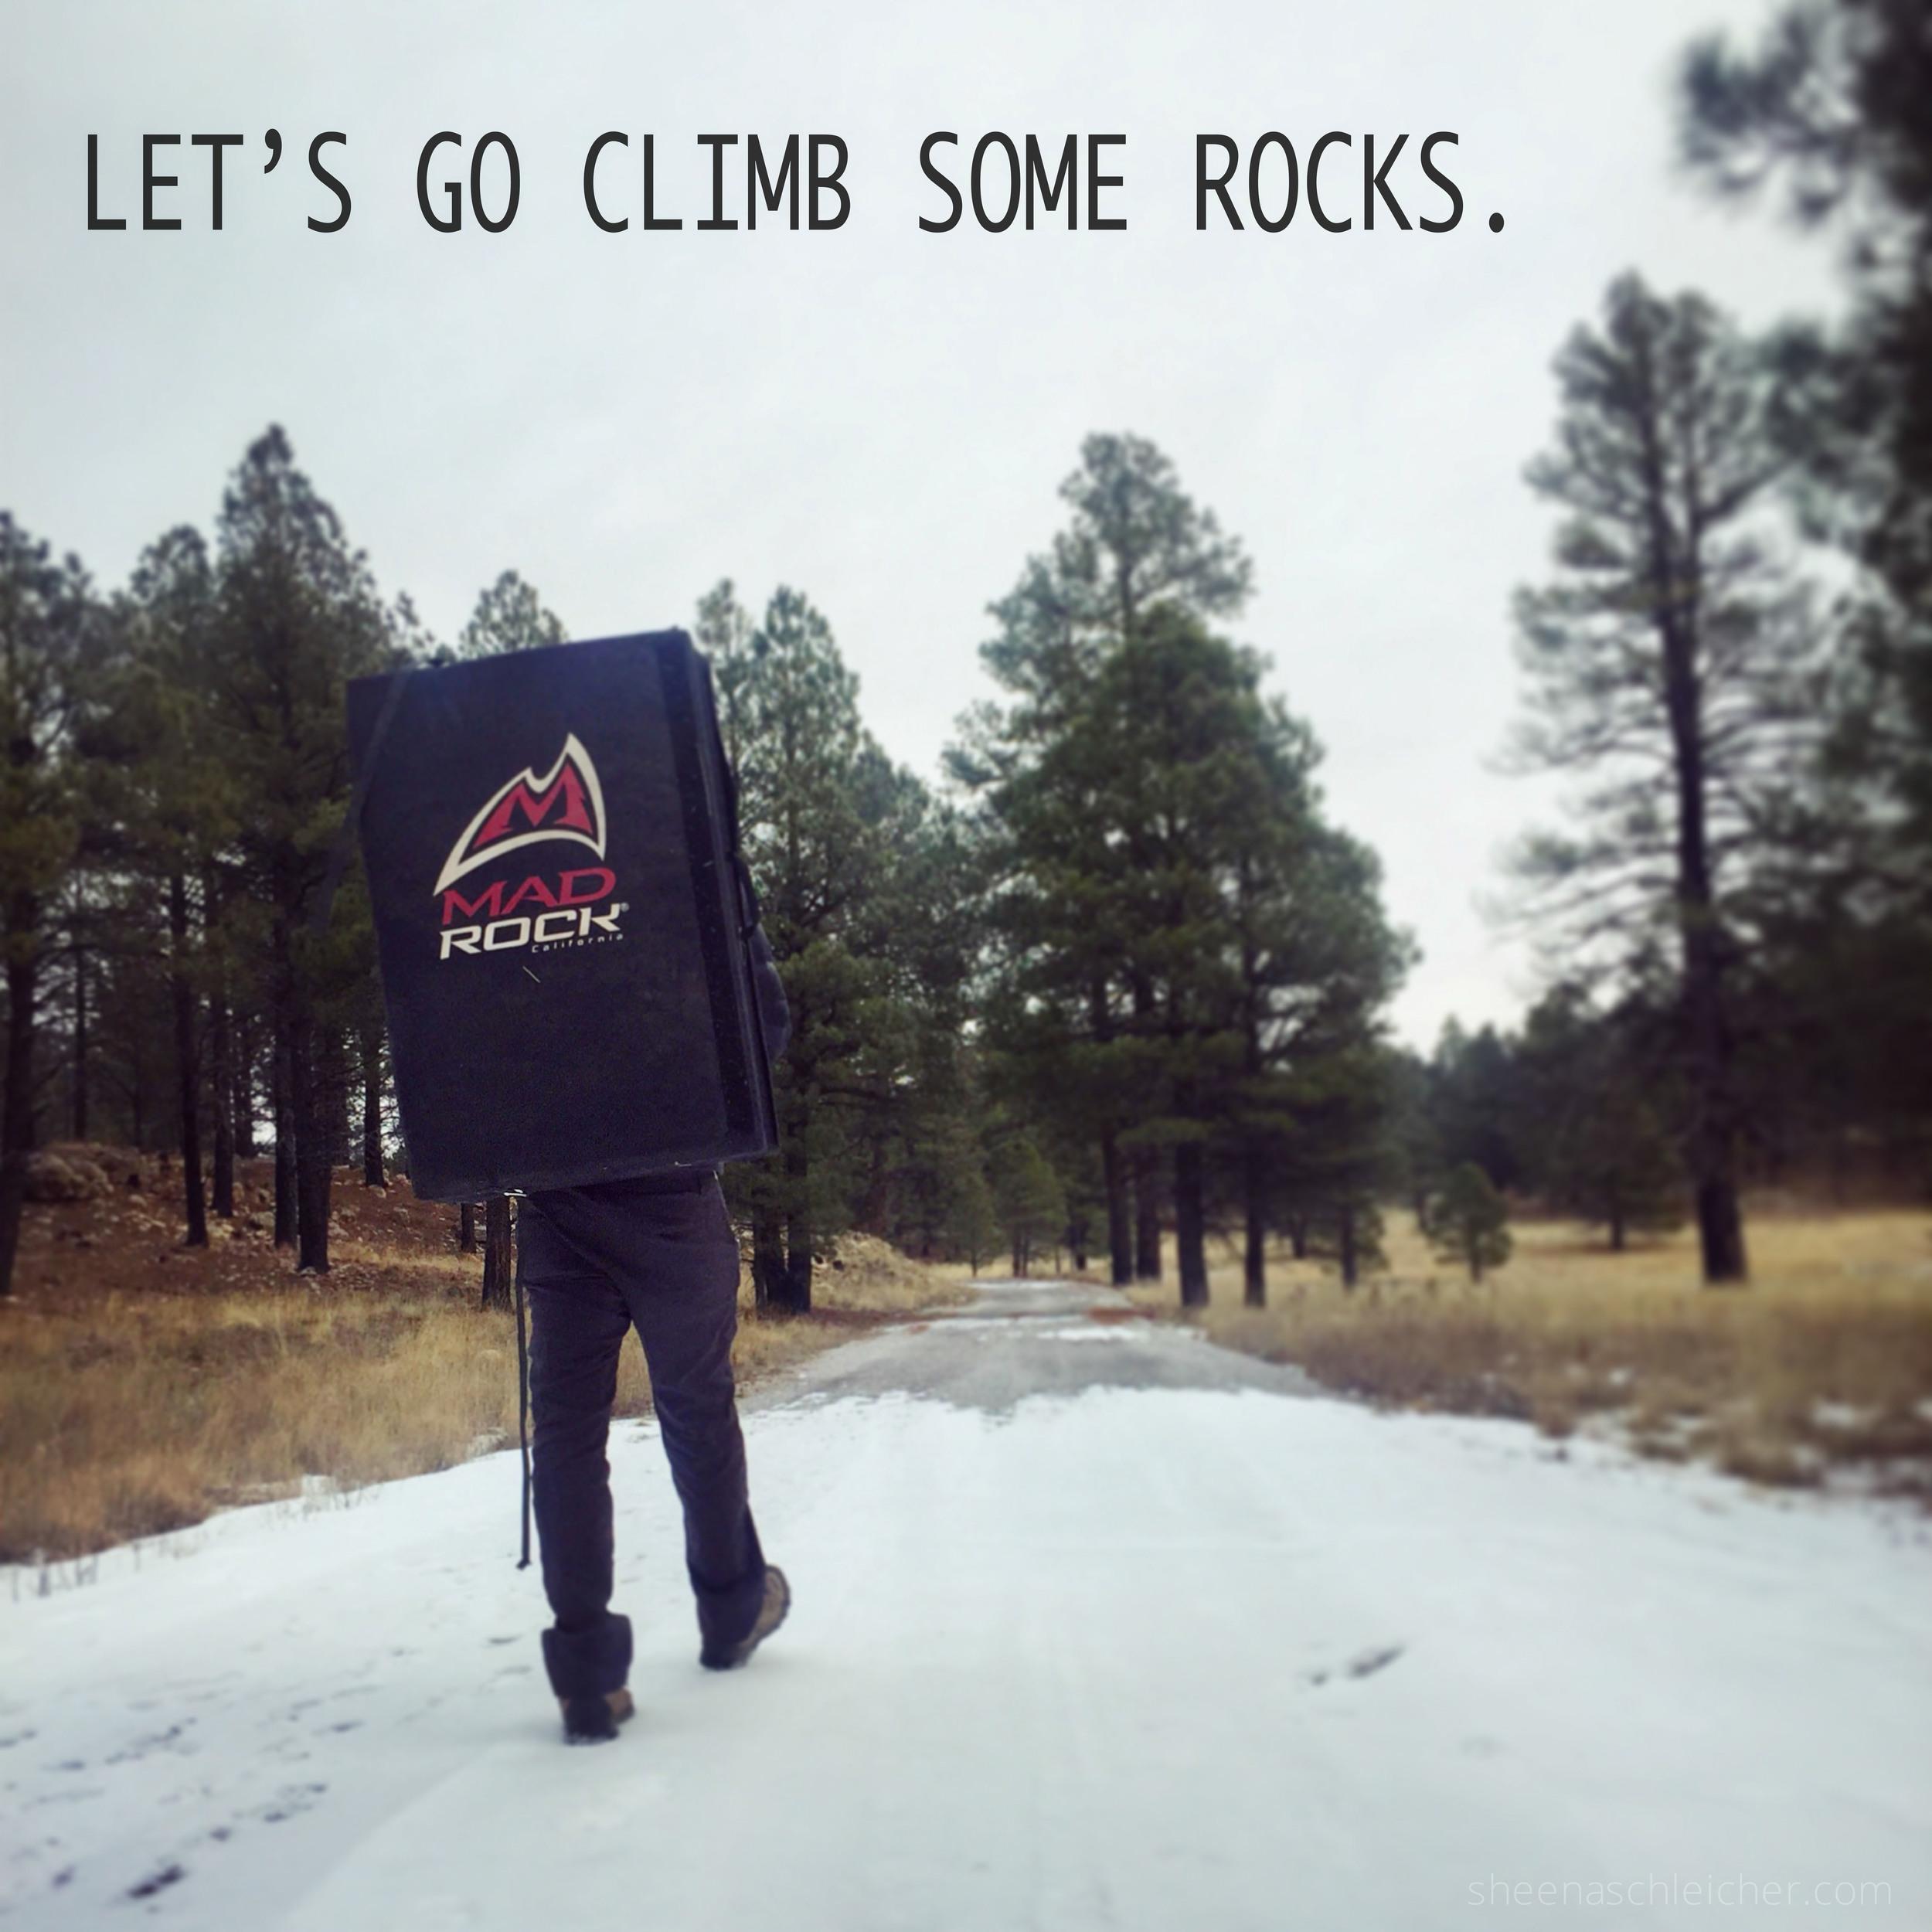 Let's go climb some rocks. #bouldering #madrock #flagstaff #az